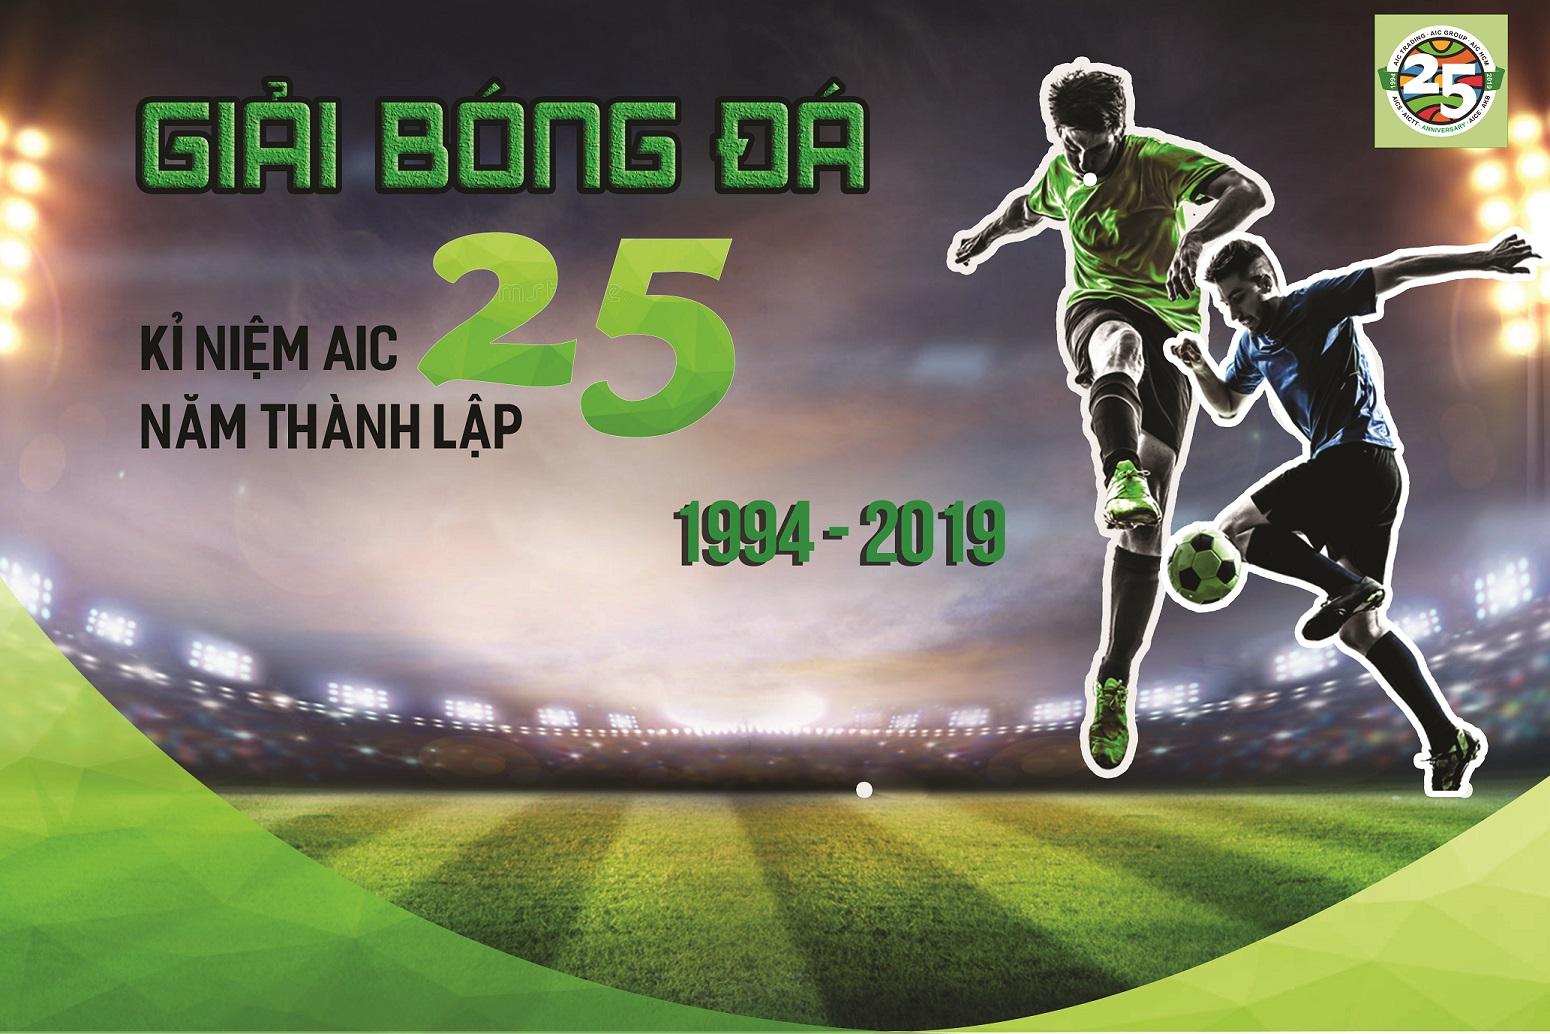 banner BĐ 01